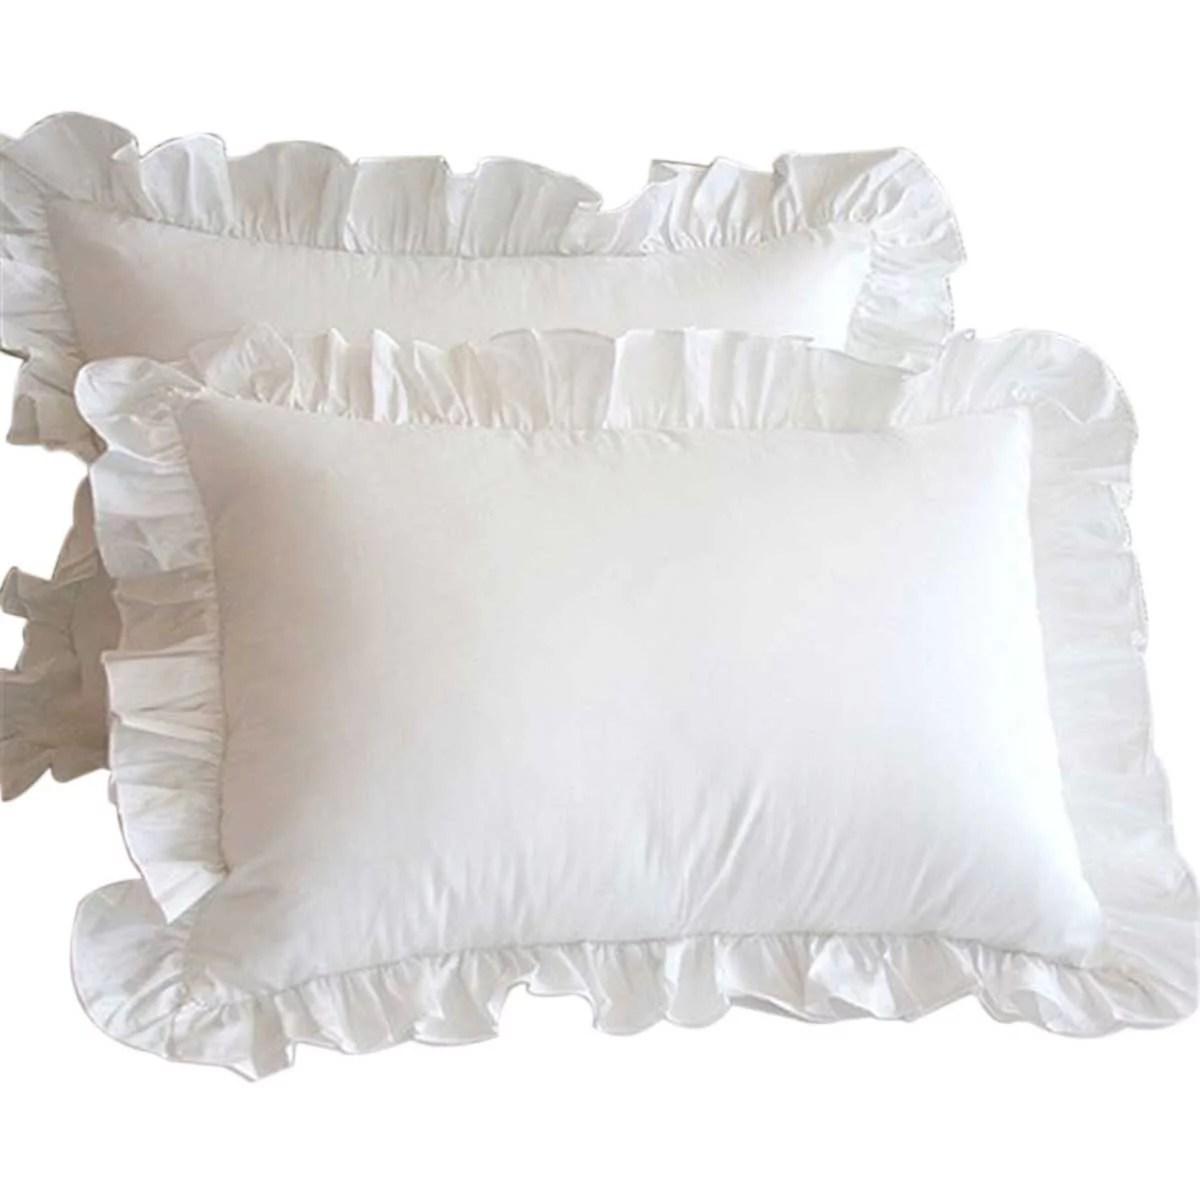 1pcs pillow case white ruffles pillow cover home textile decoration pillowcase for bedding room